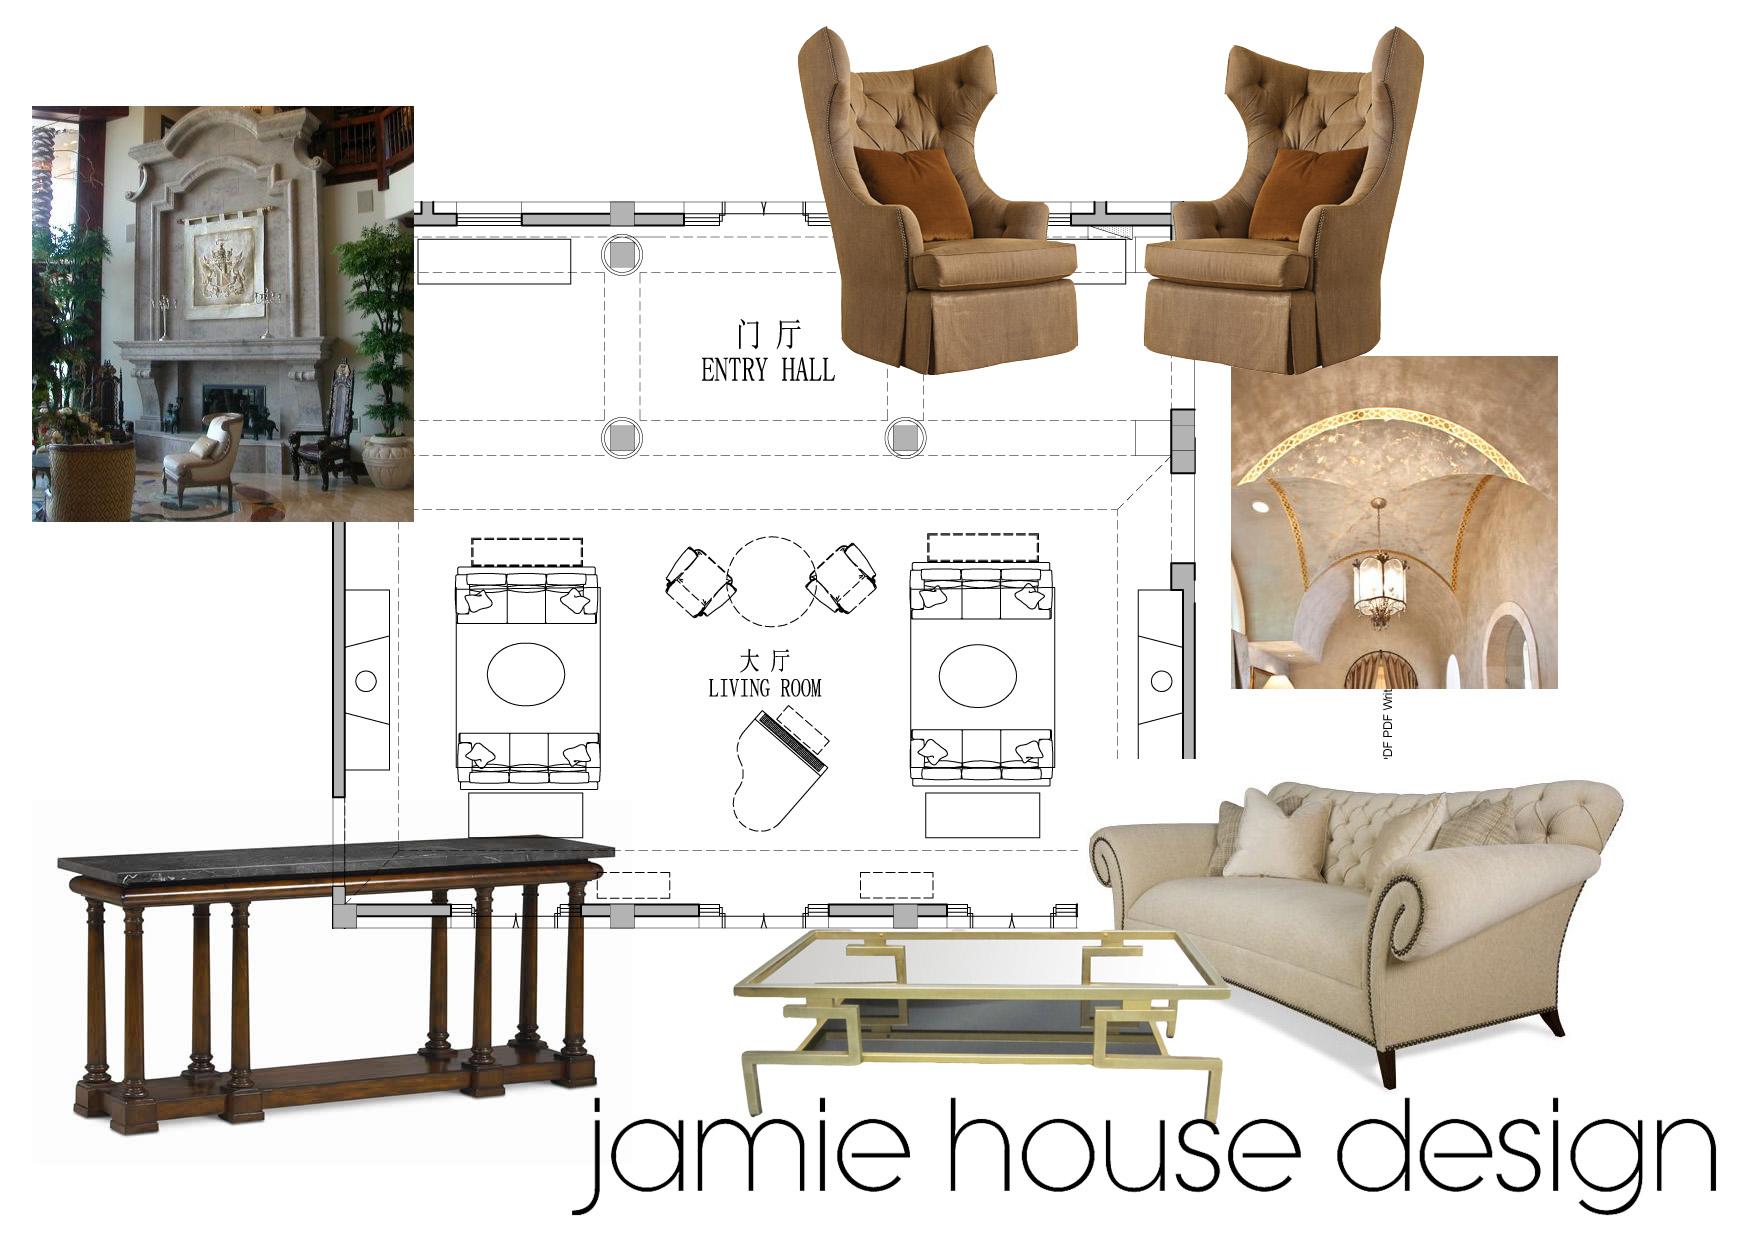 The interior design process part 2 jamie house design for Interior design process